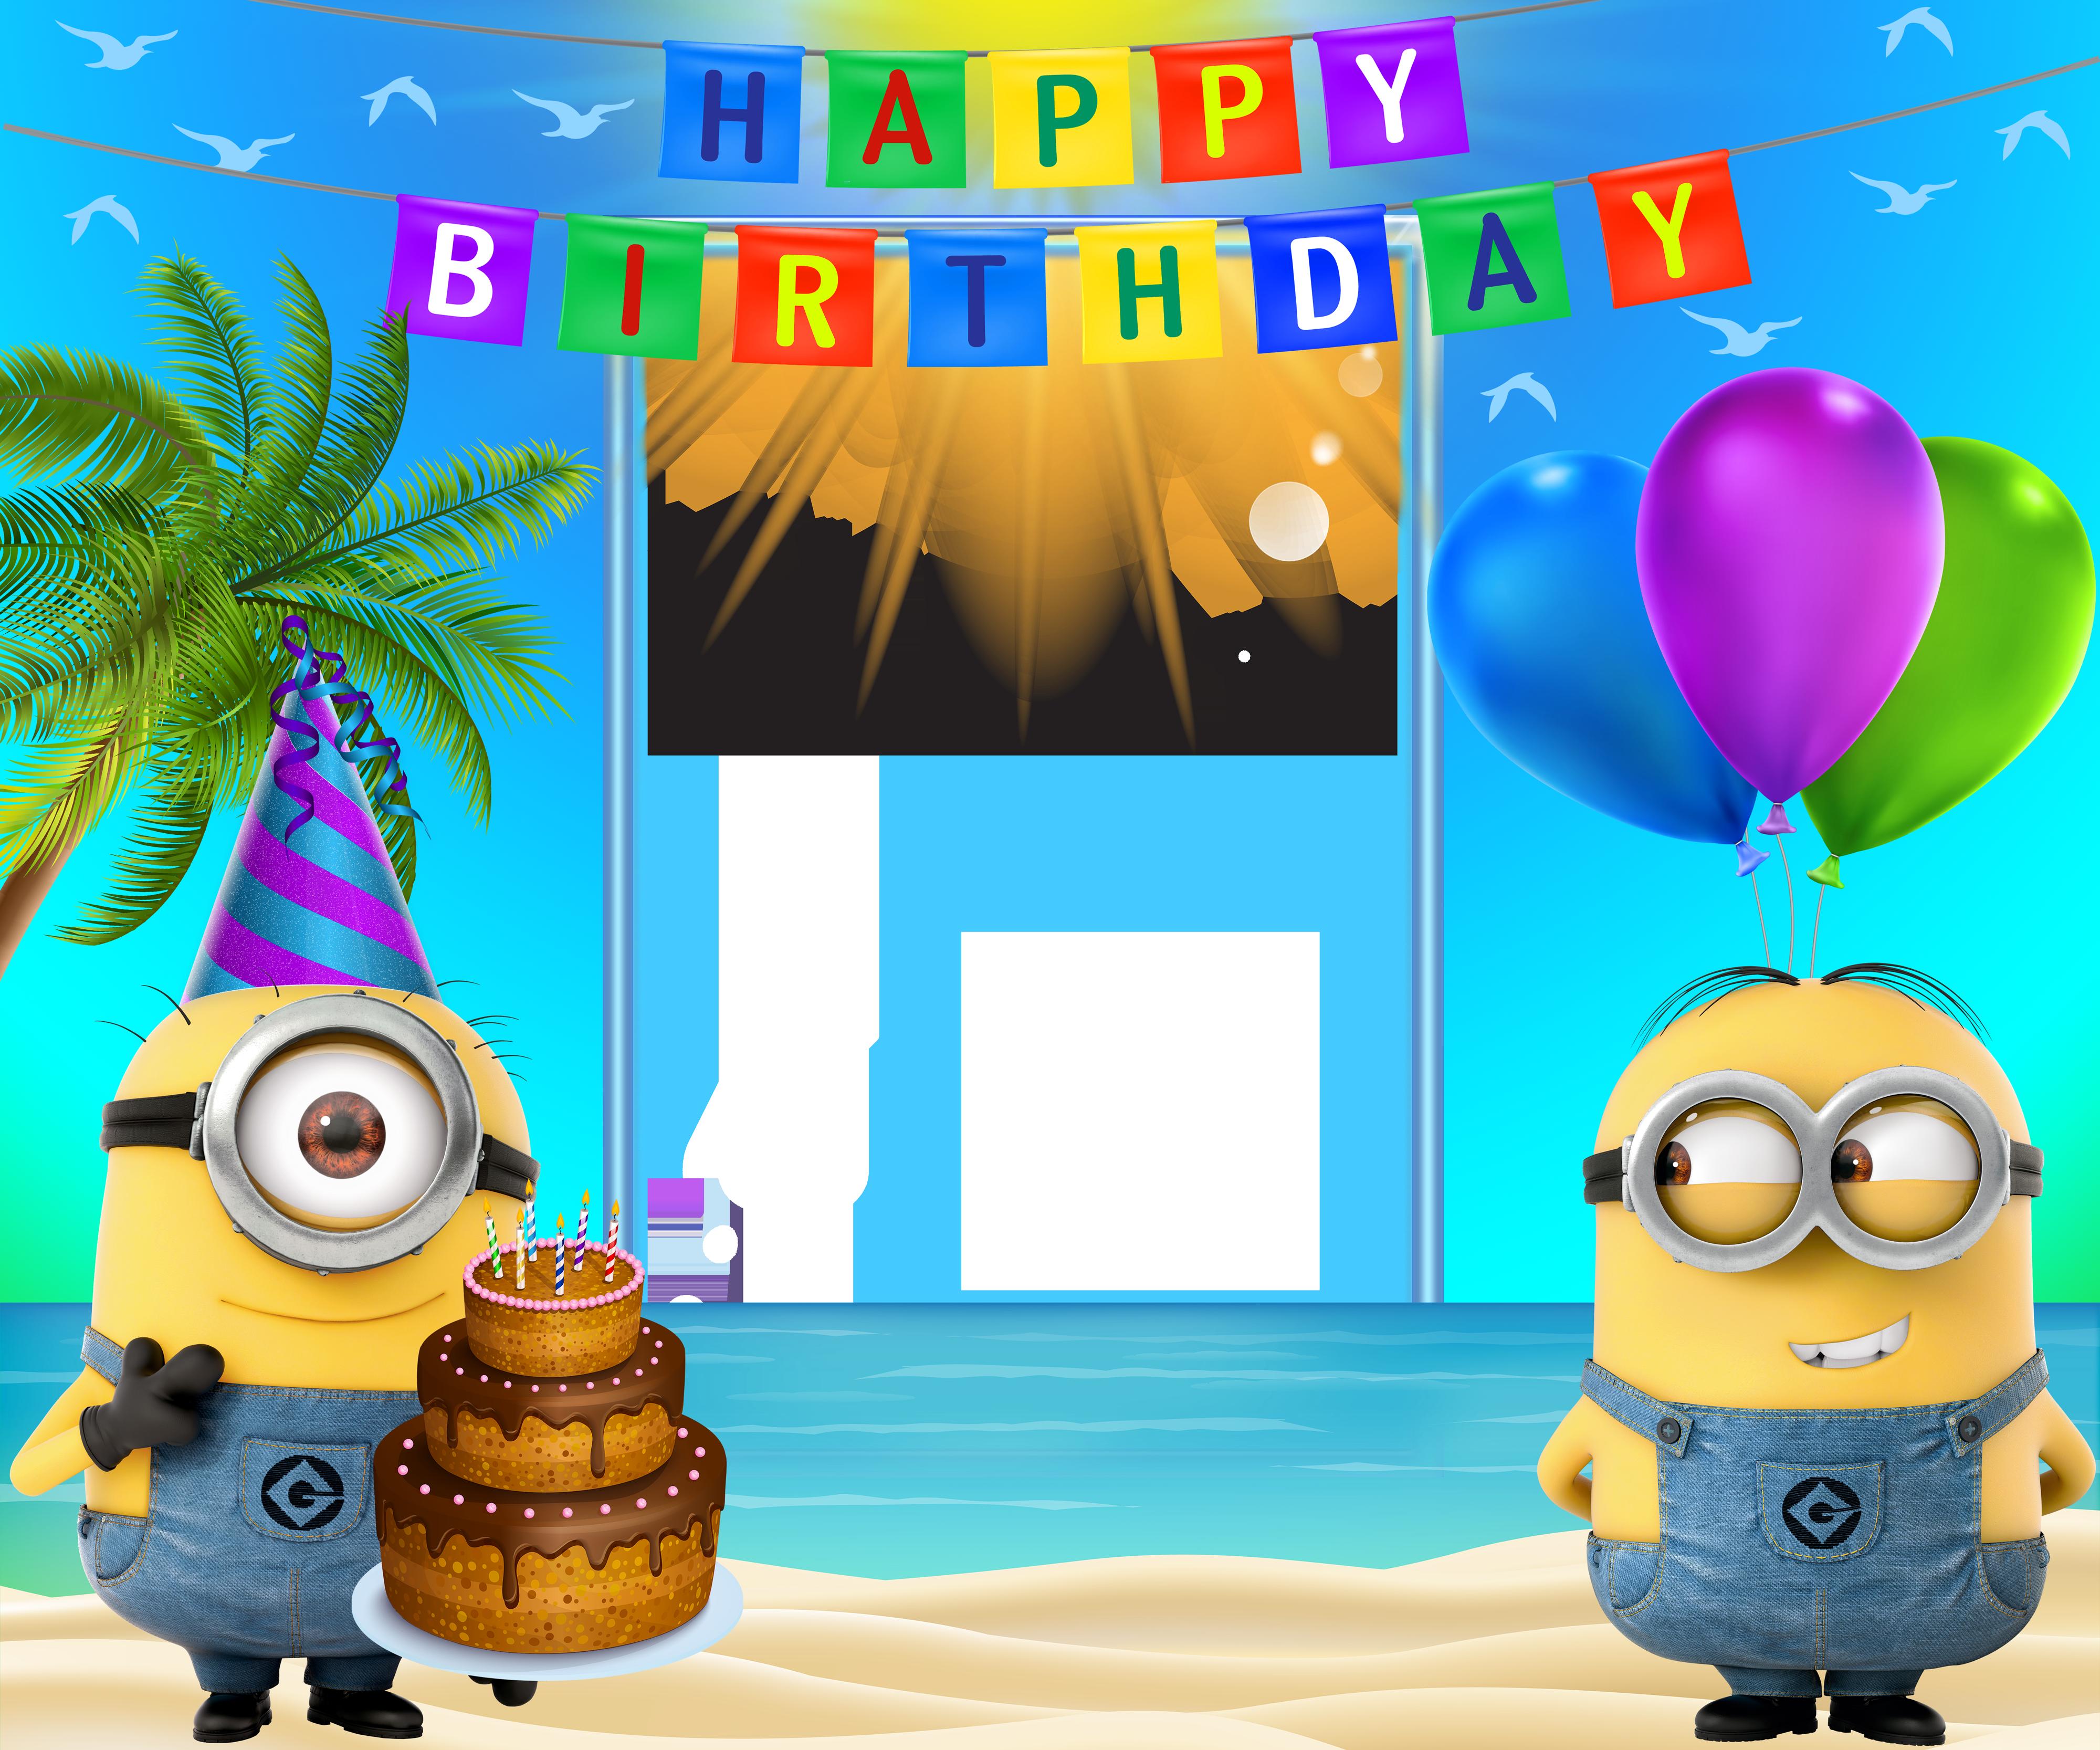 Minion happy birthday clipart clip art free stock Happy Birthday Transparent Frame with Minions   Gallery ... clip art free stock